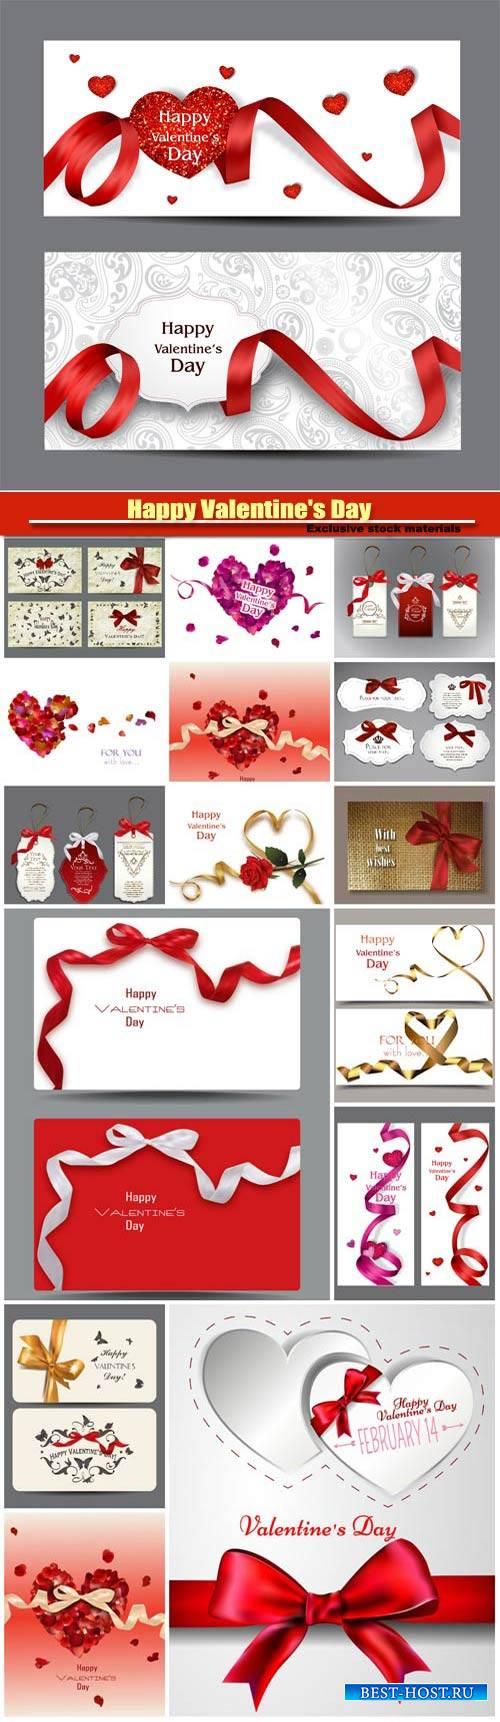 Happy Valentine's Day vector, hearts, romance, love #3